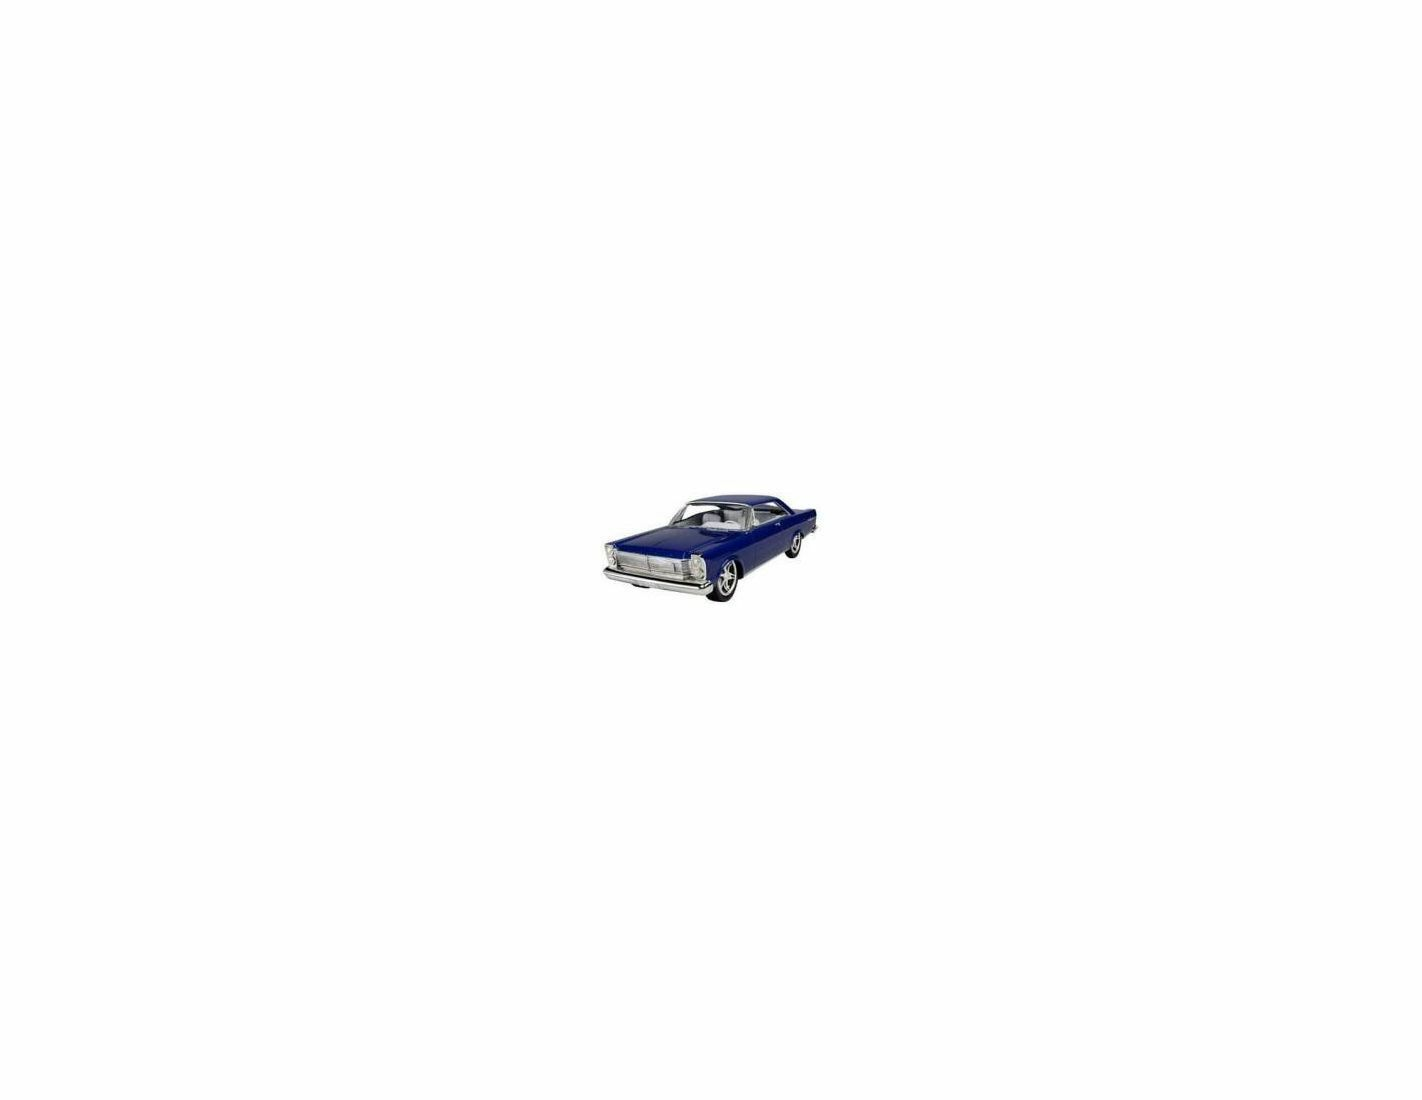 ERTL 38261 FORD GALAXIE 500'65 KIT 1 25 Modellino